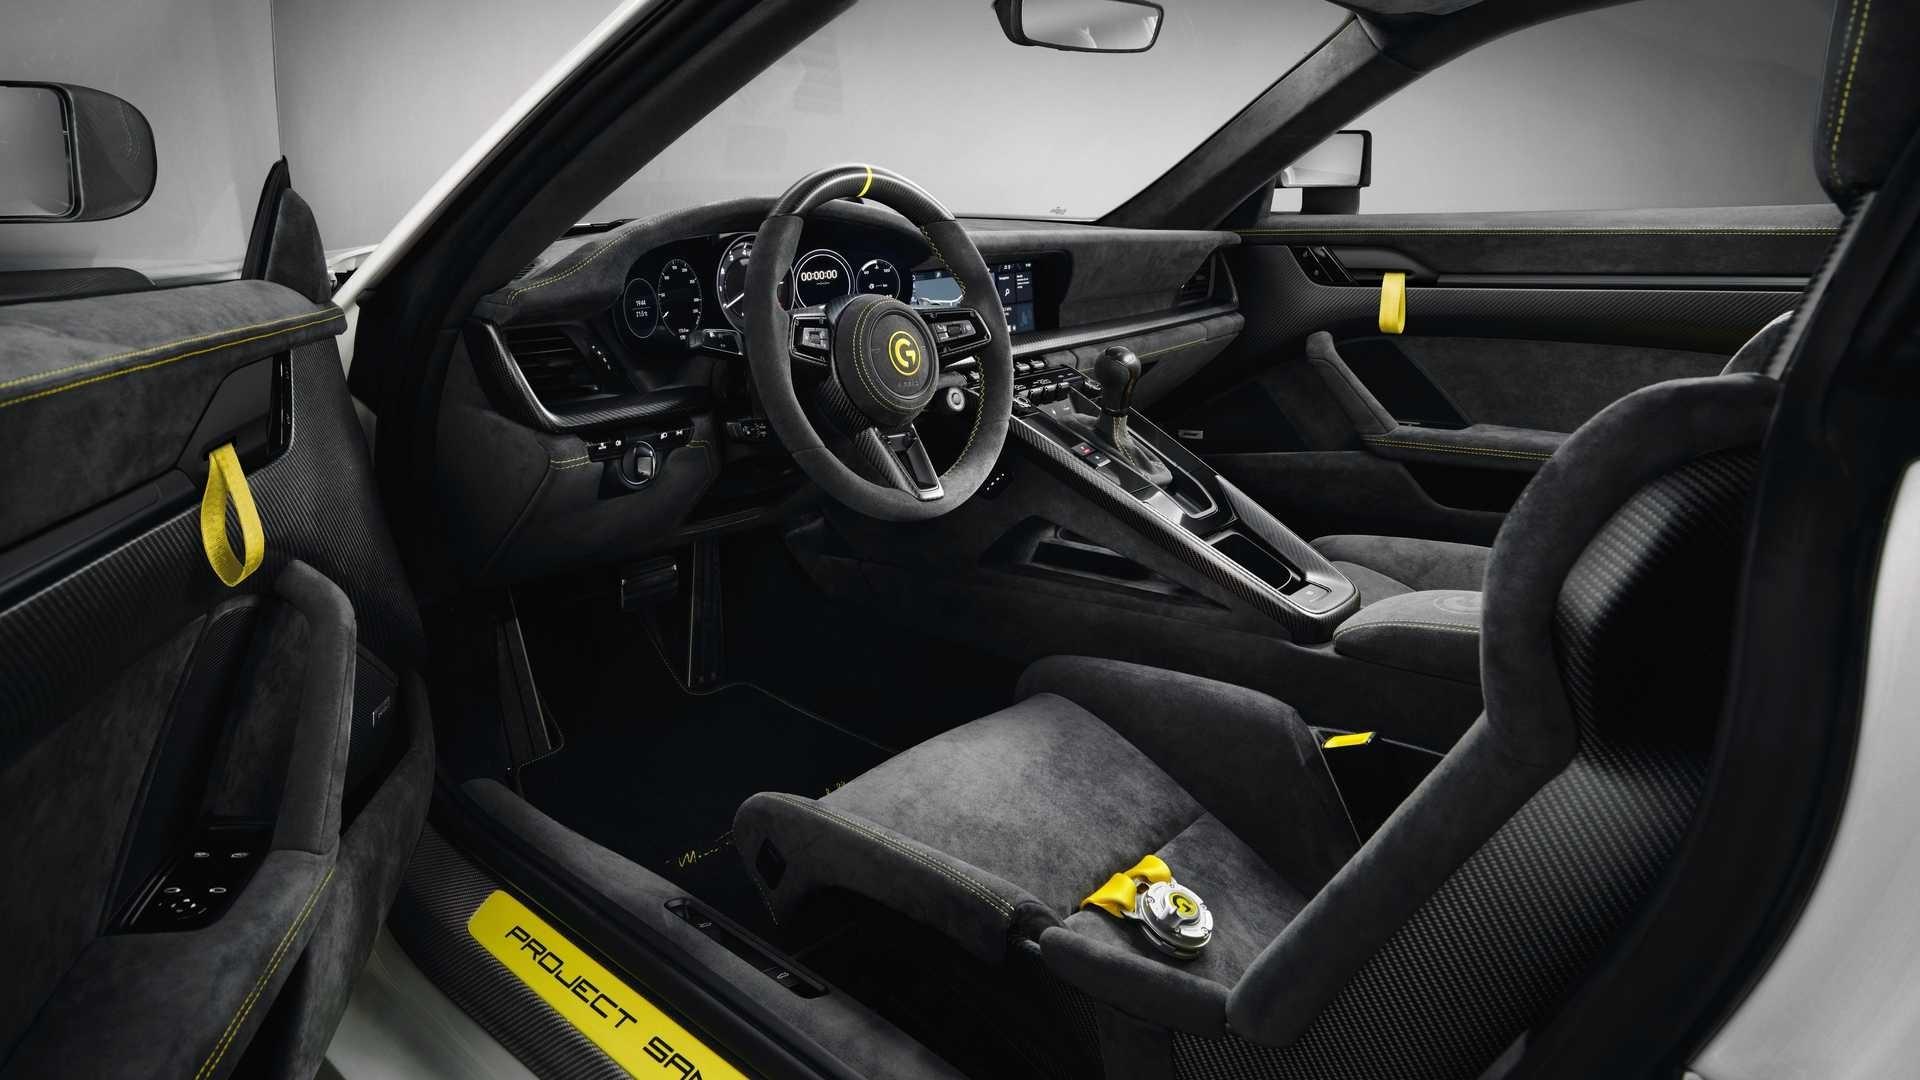 Gemballa Marsien Porsche 911 Safari 0721 001